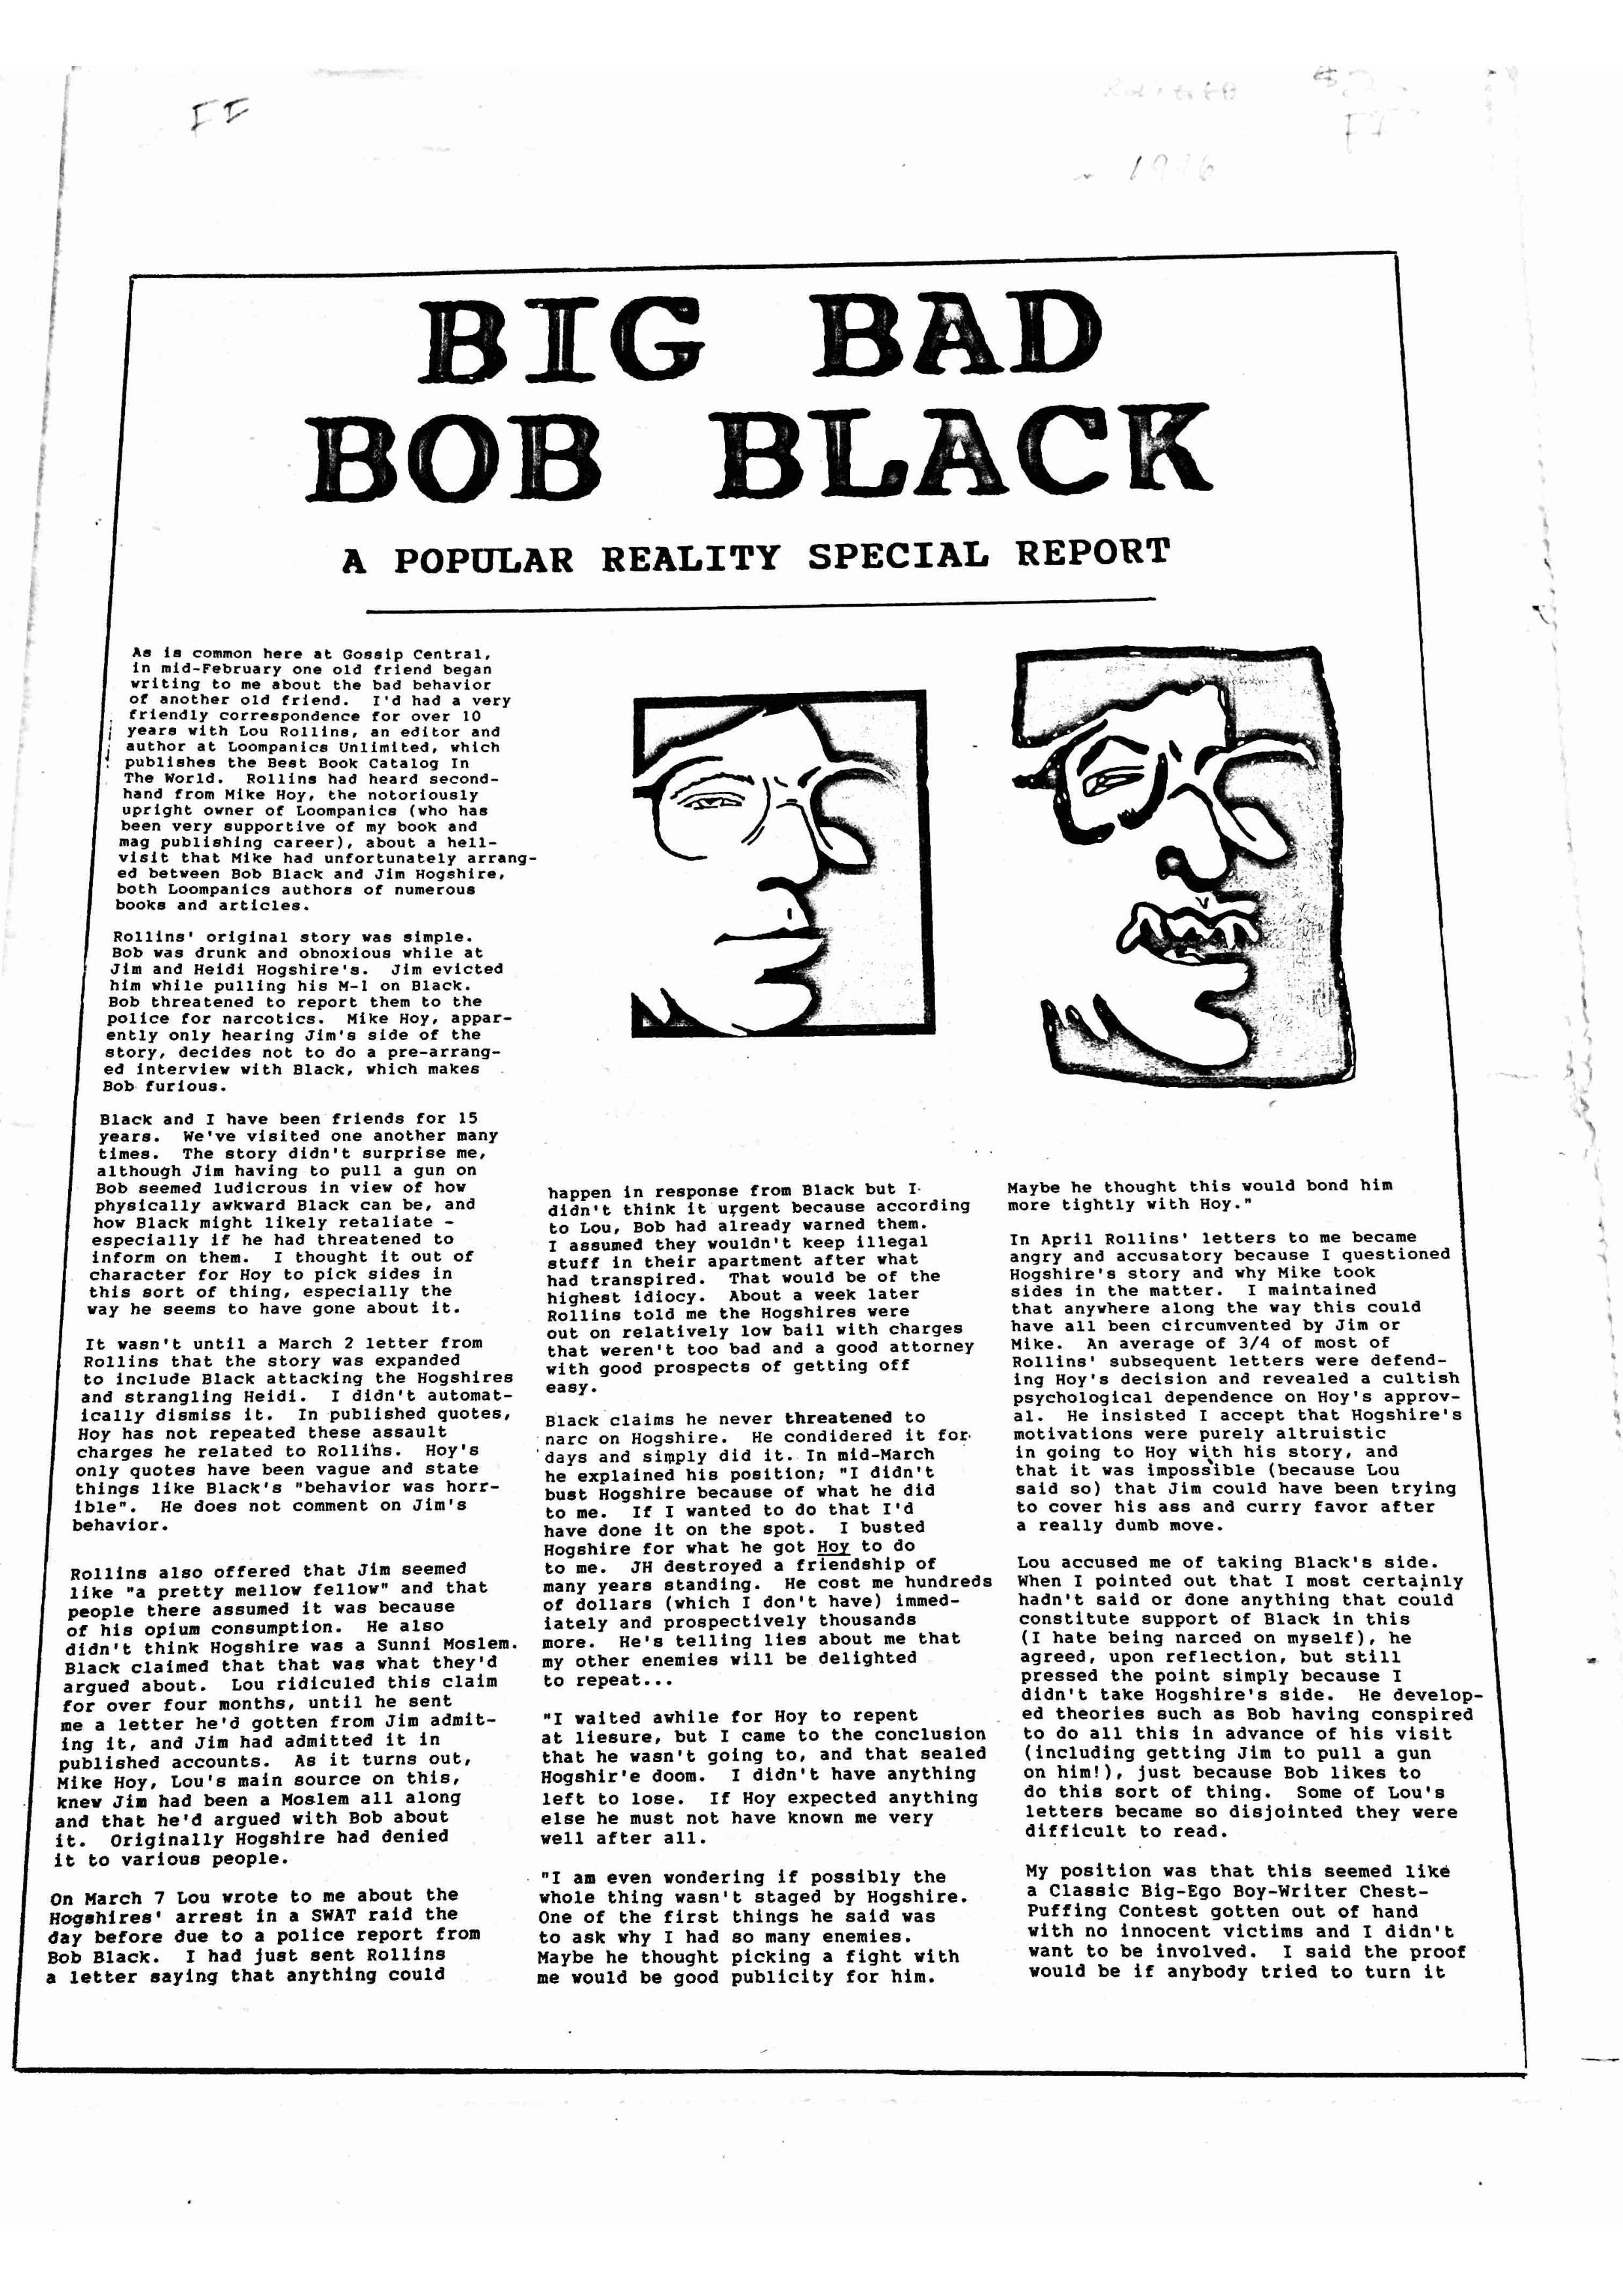 PopRealBlack-page-001.jpg